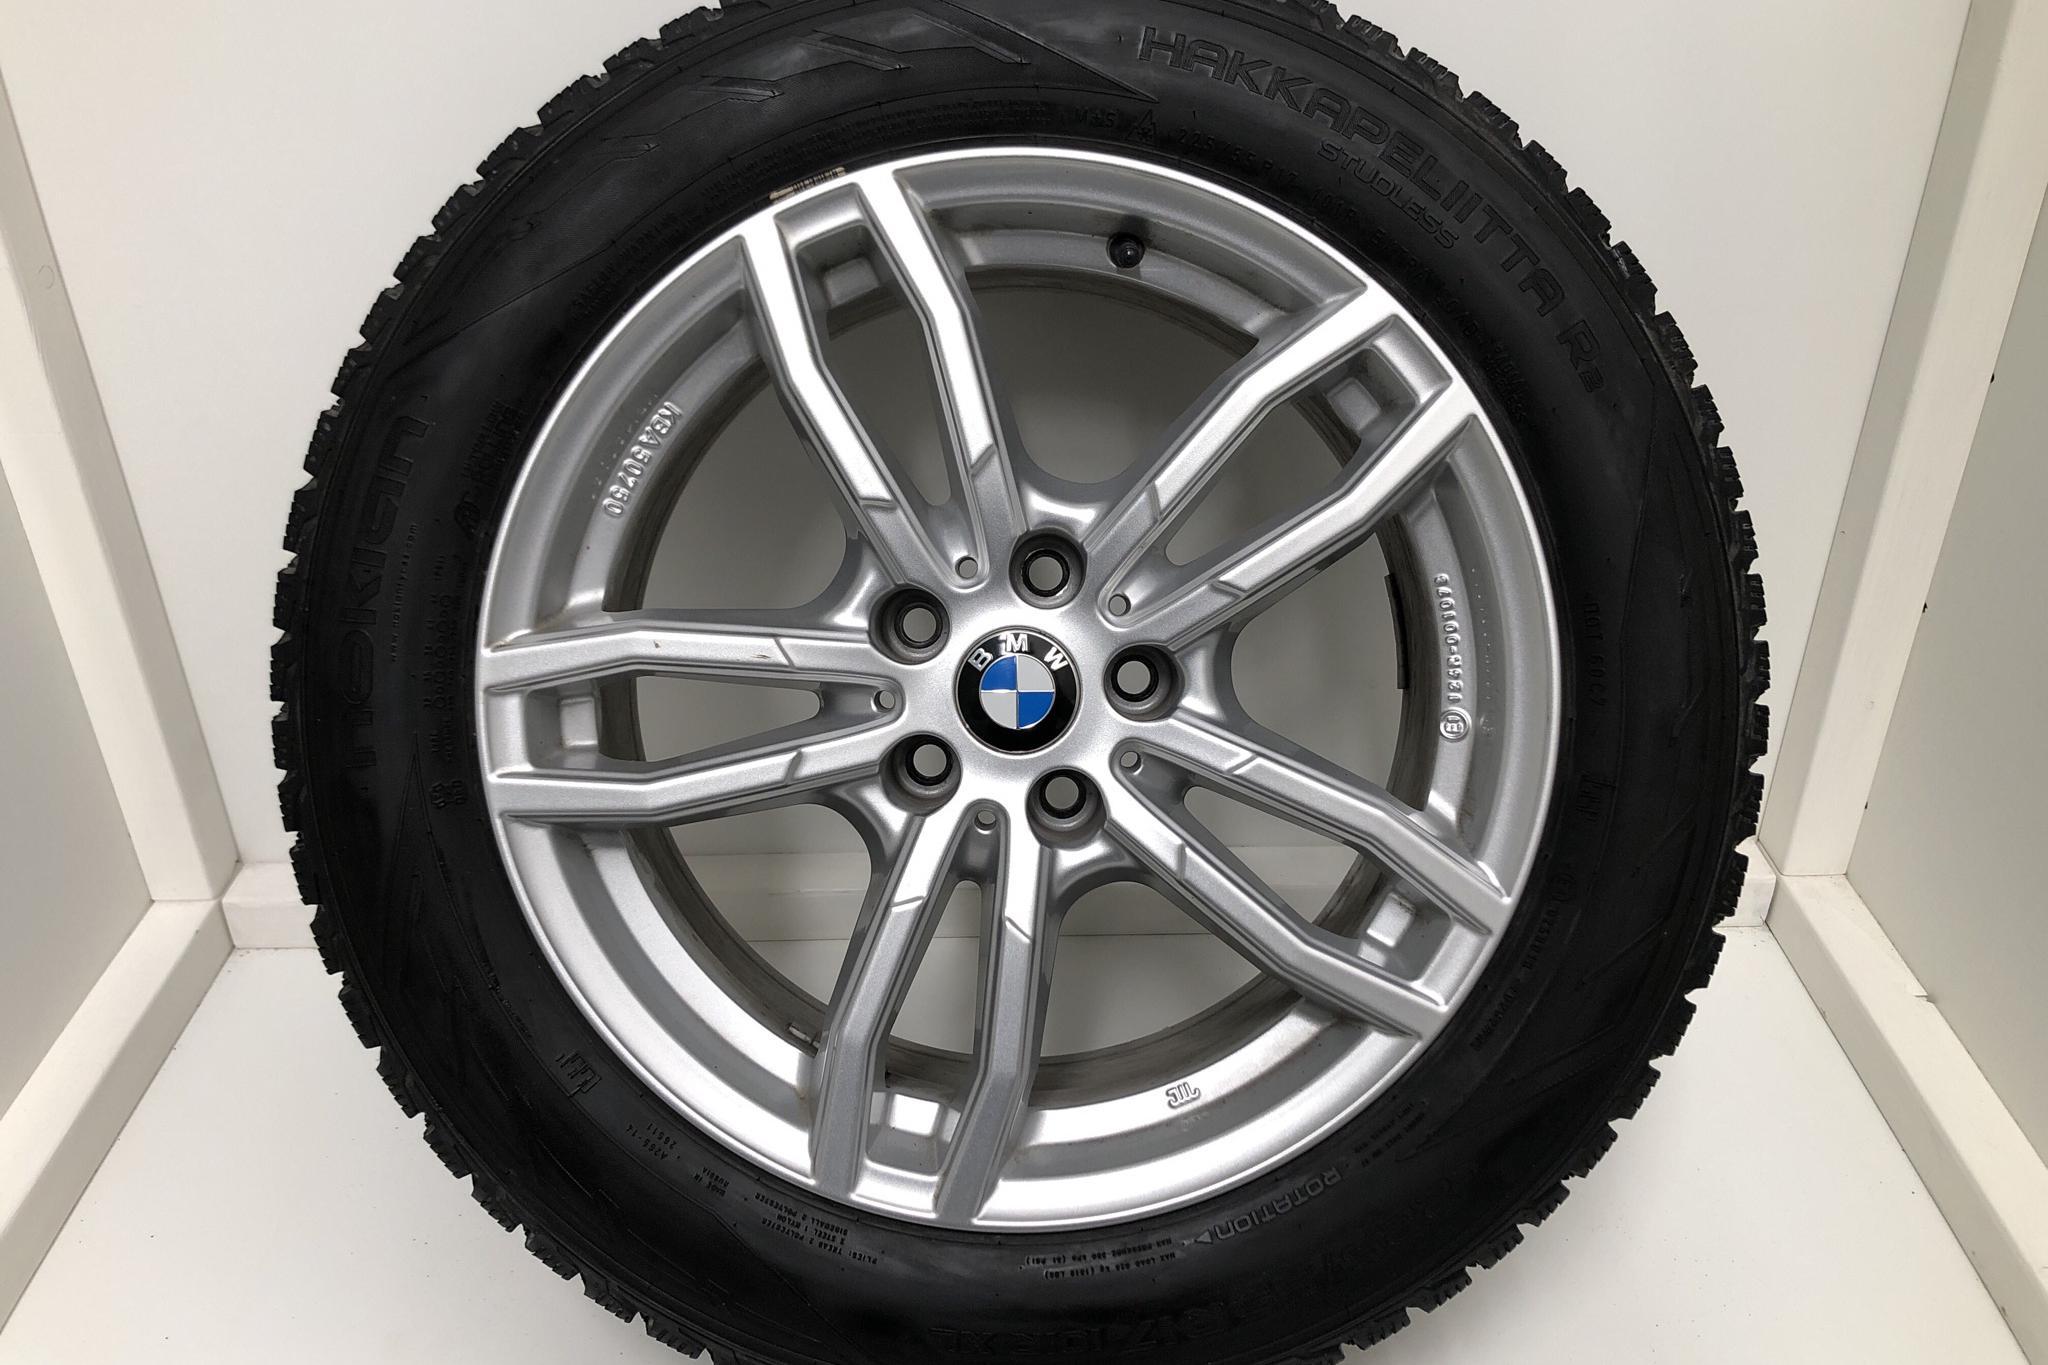 BMW 520d xDrive Touring, G31 (190hk) - 4 883 mil - Automat - grå - 2018